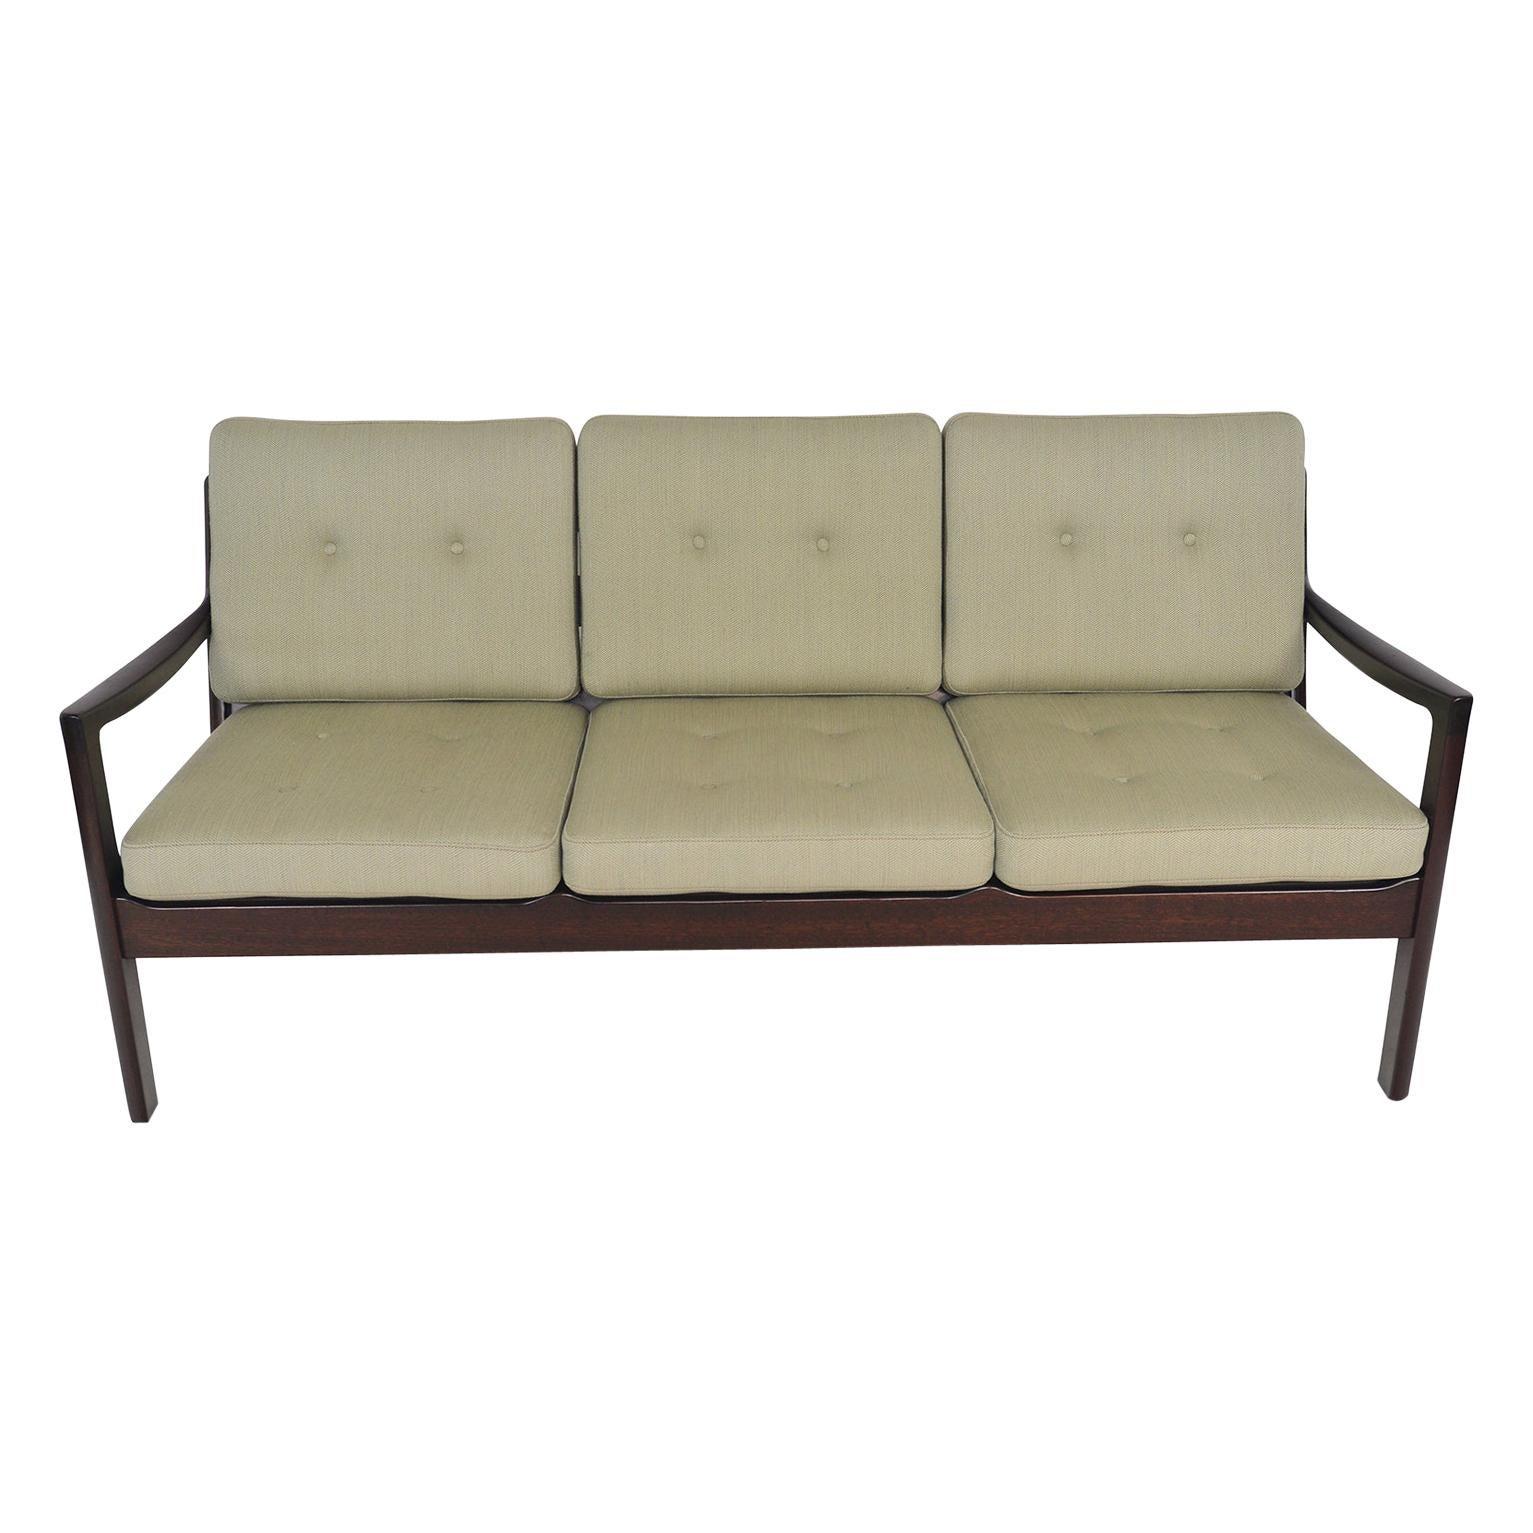 Ole Wanscher Senator Three Seat Sofa in Mahogany